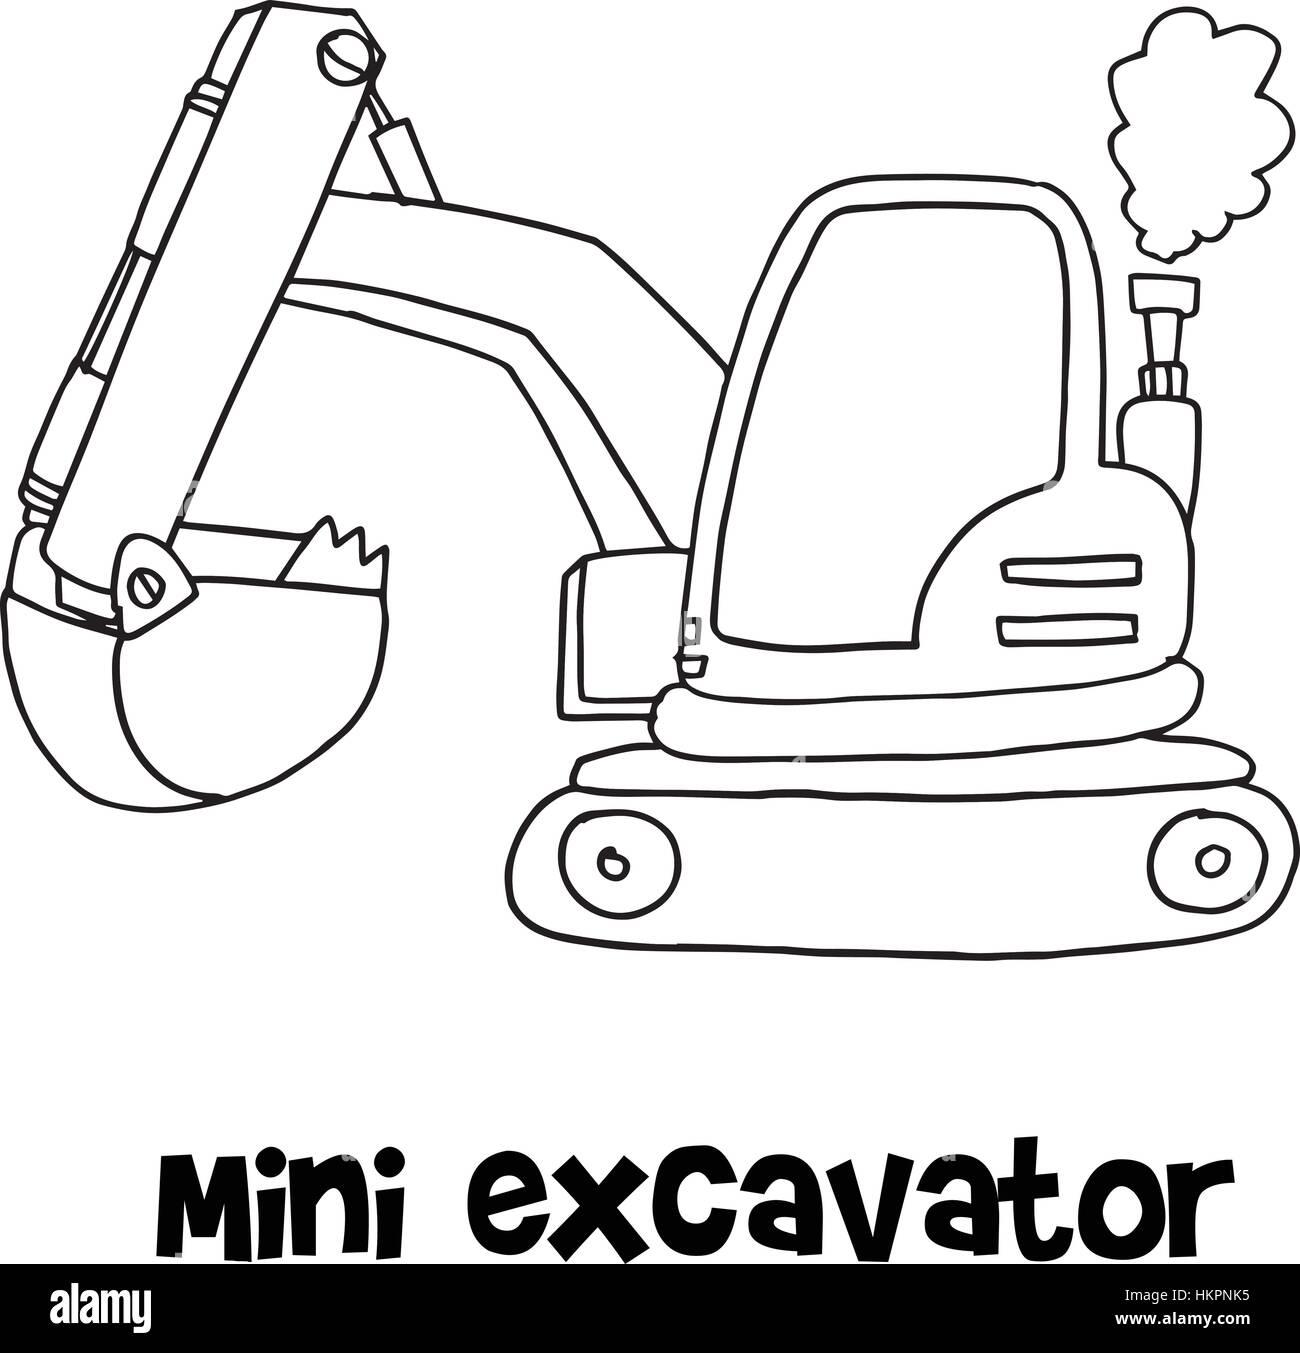 Excavator Black and White Stock Photos & Images - Alamy